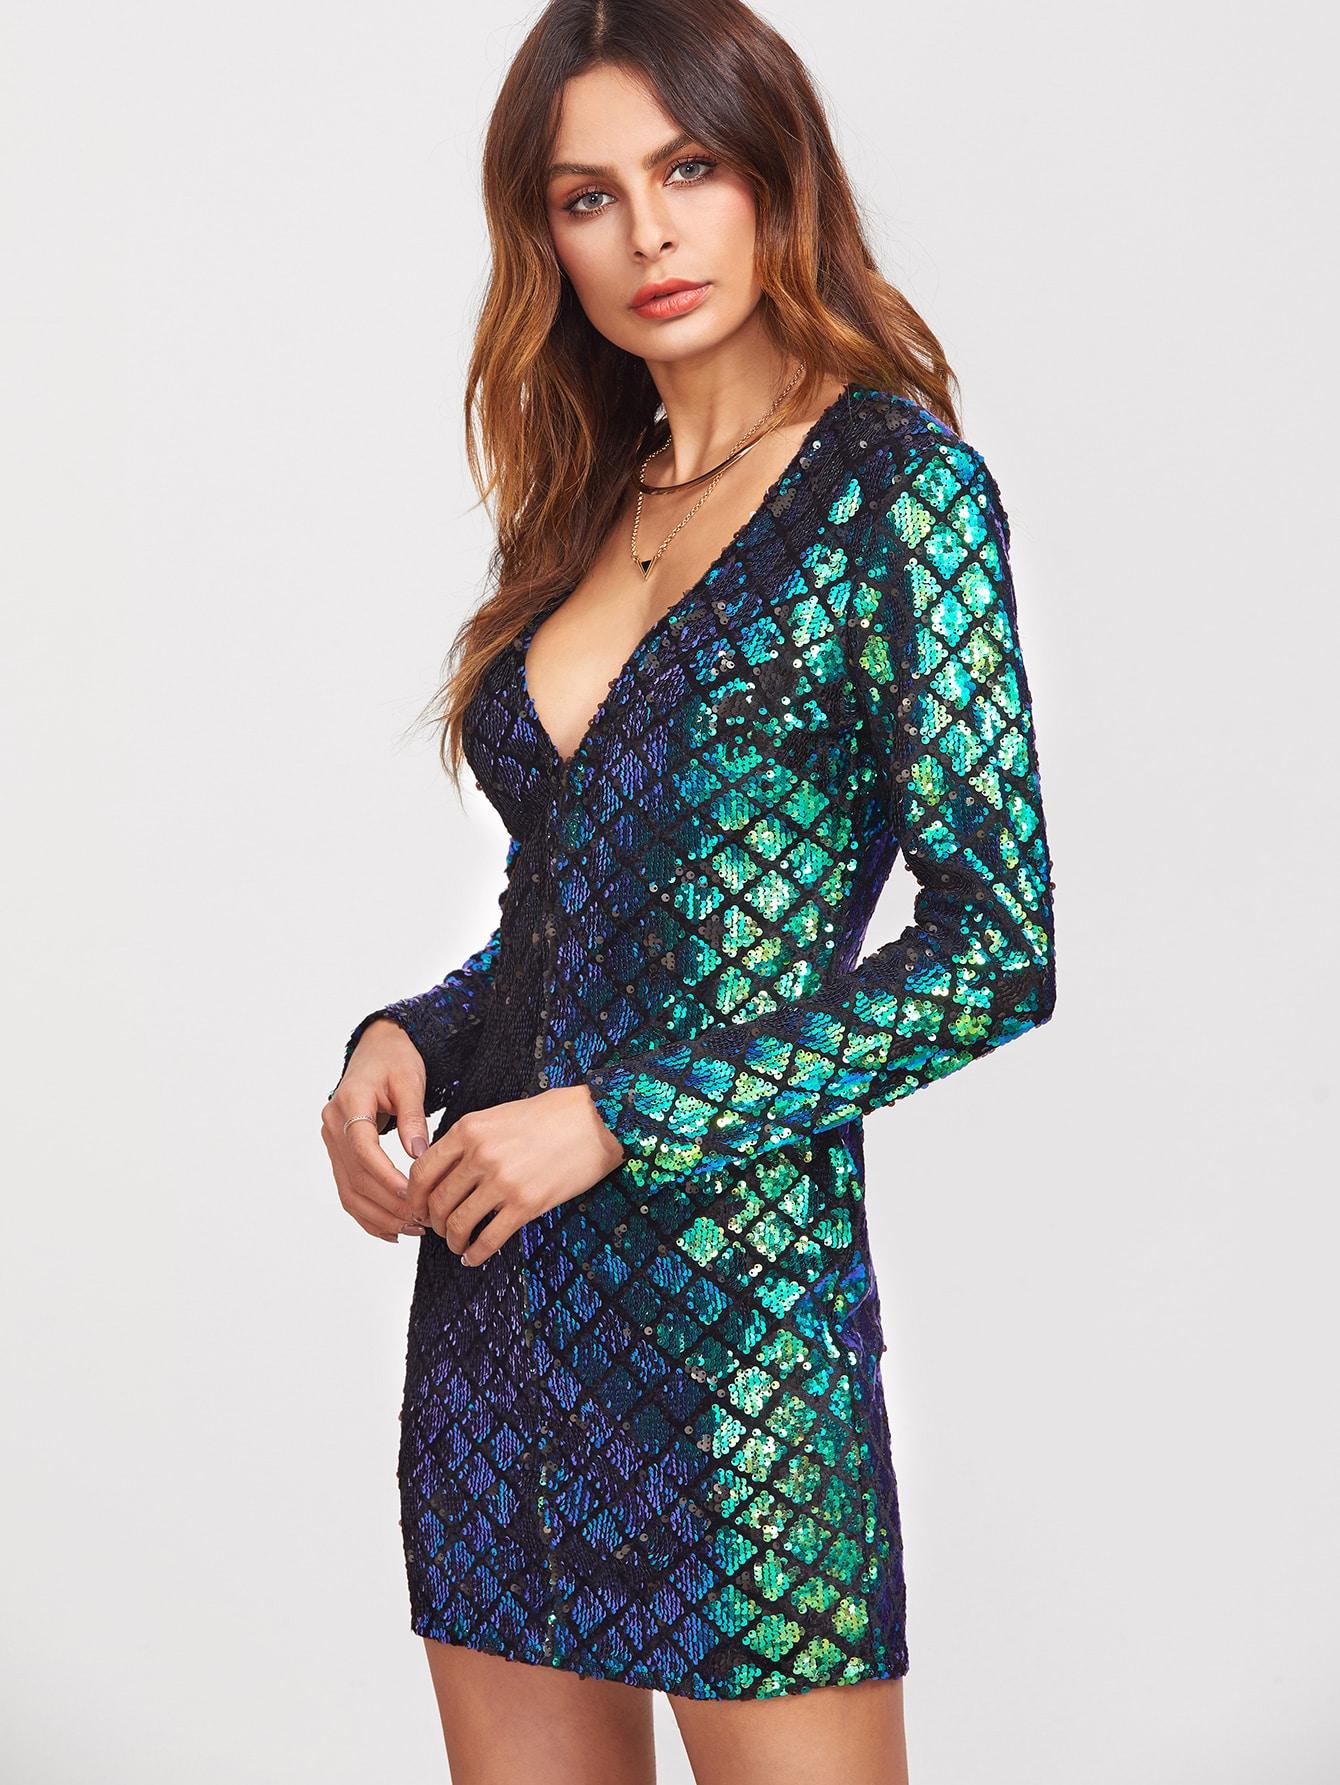 peacock green deep v neck sequin bodycon dress emmacloth-women fast